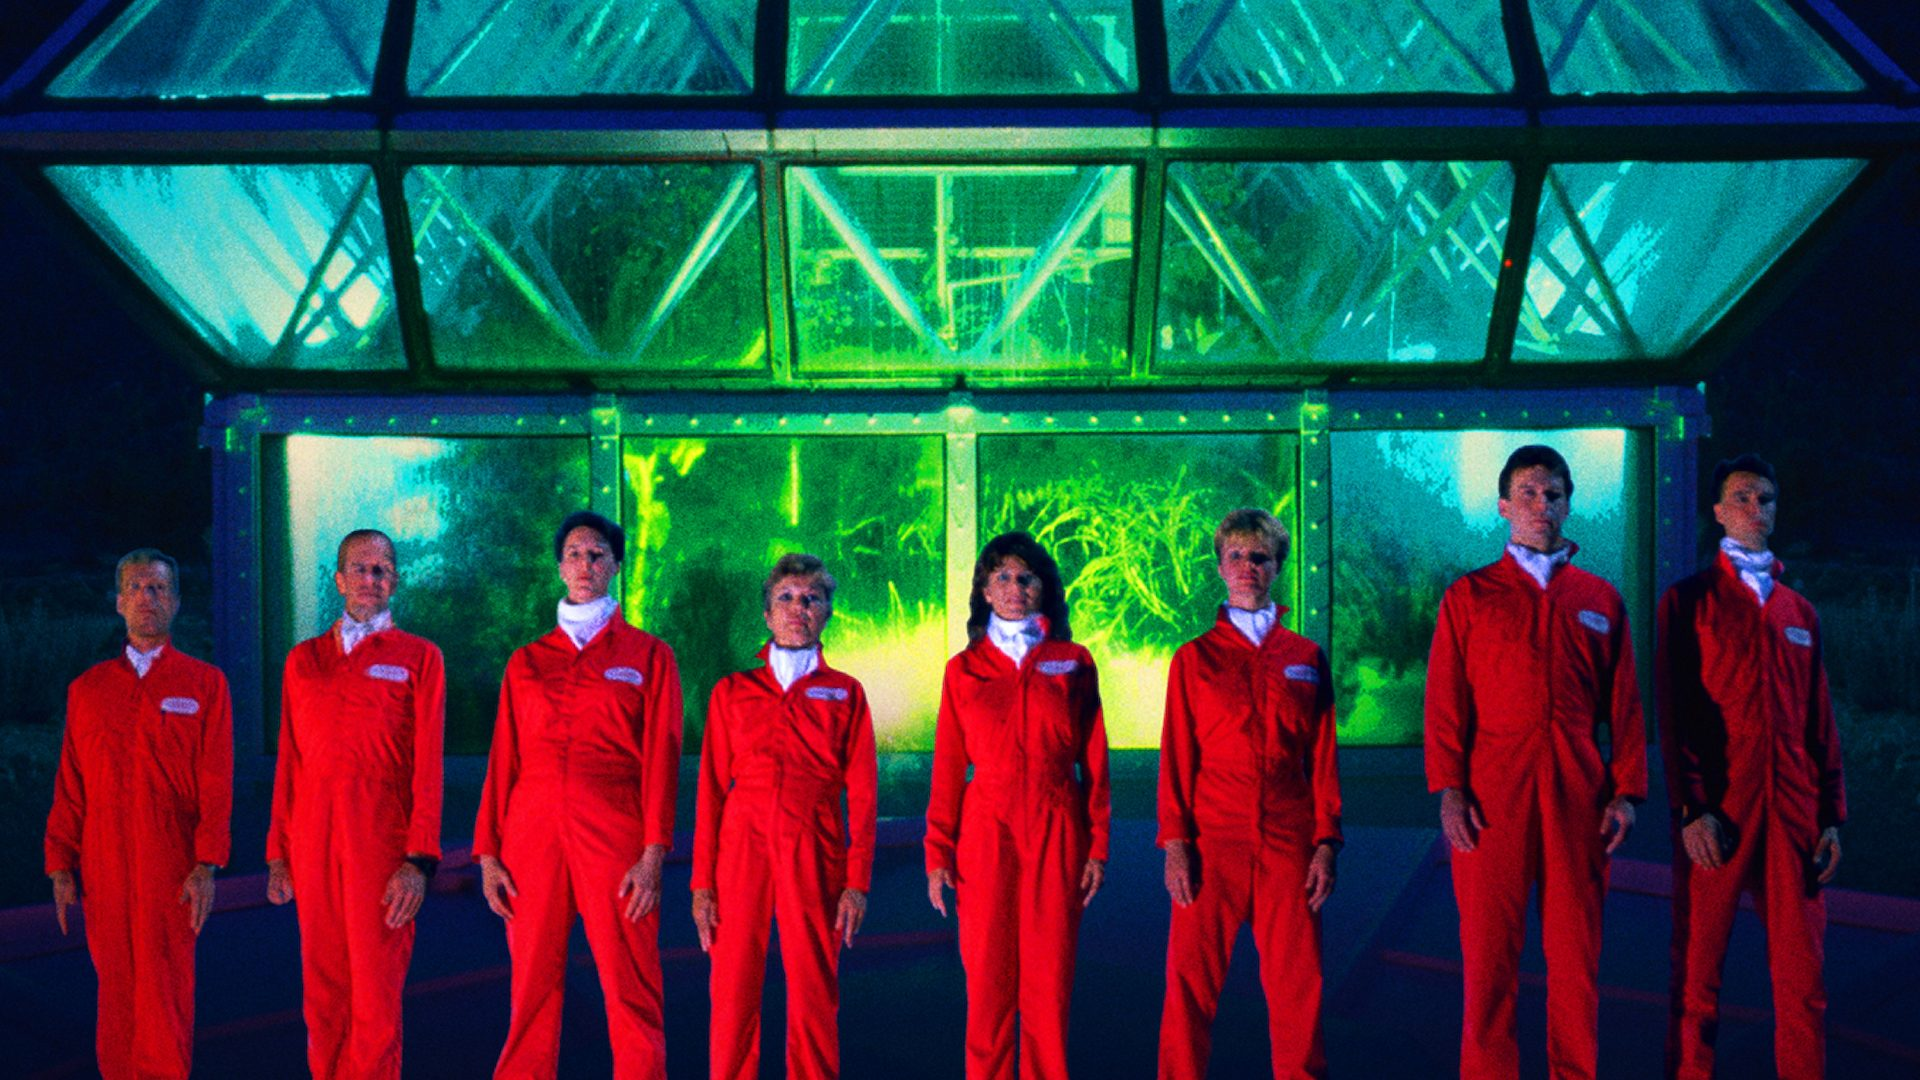 SpaceshipEarth_2x1nologo